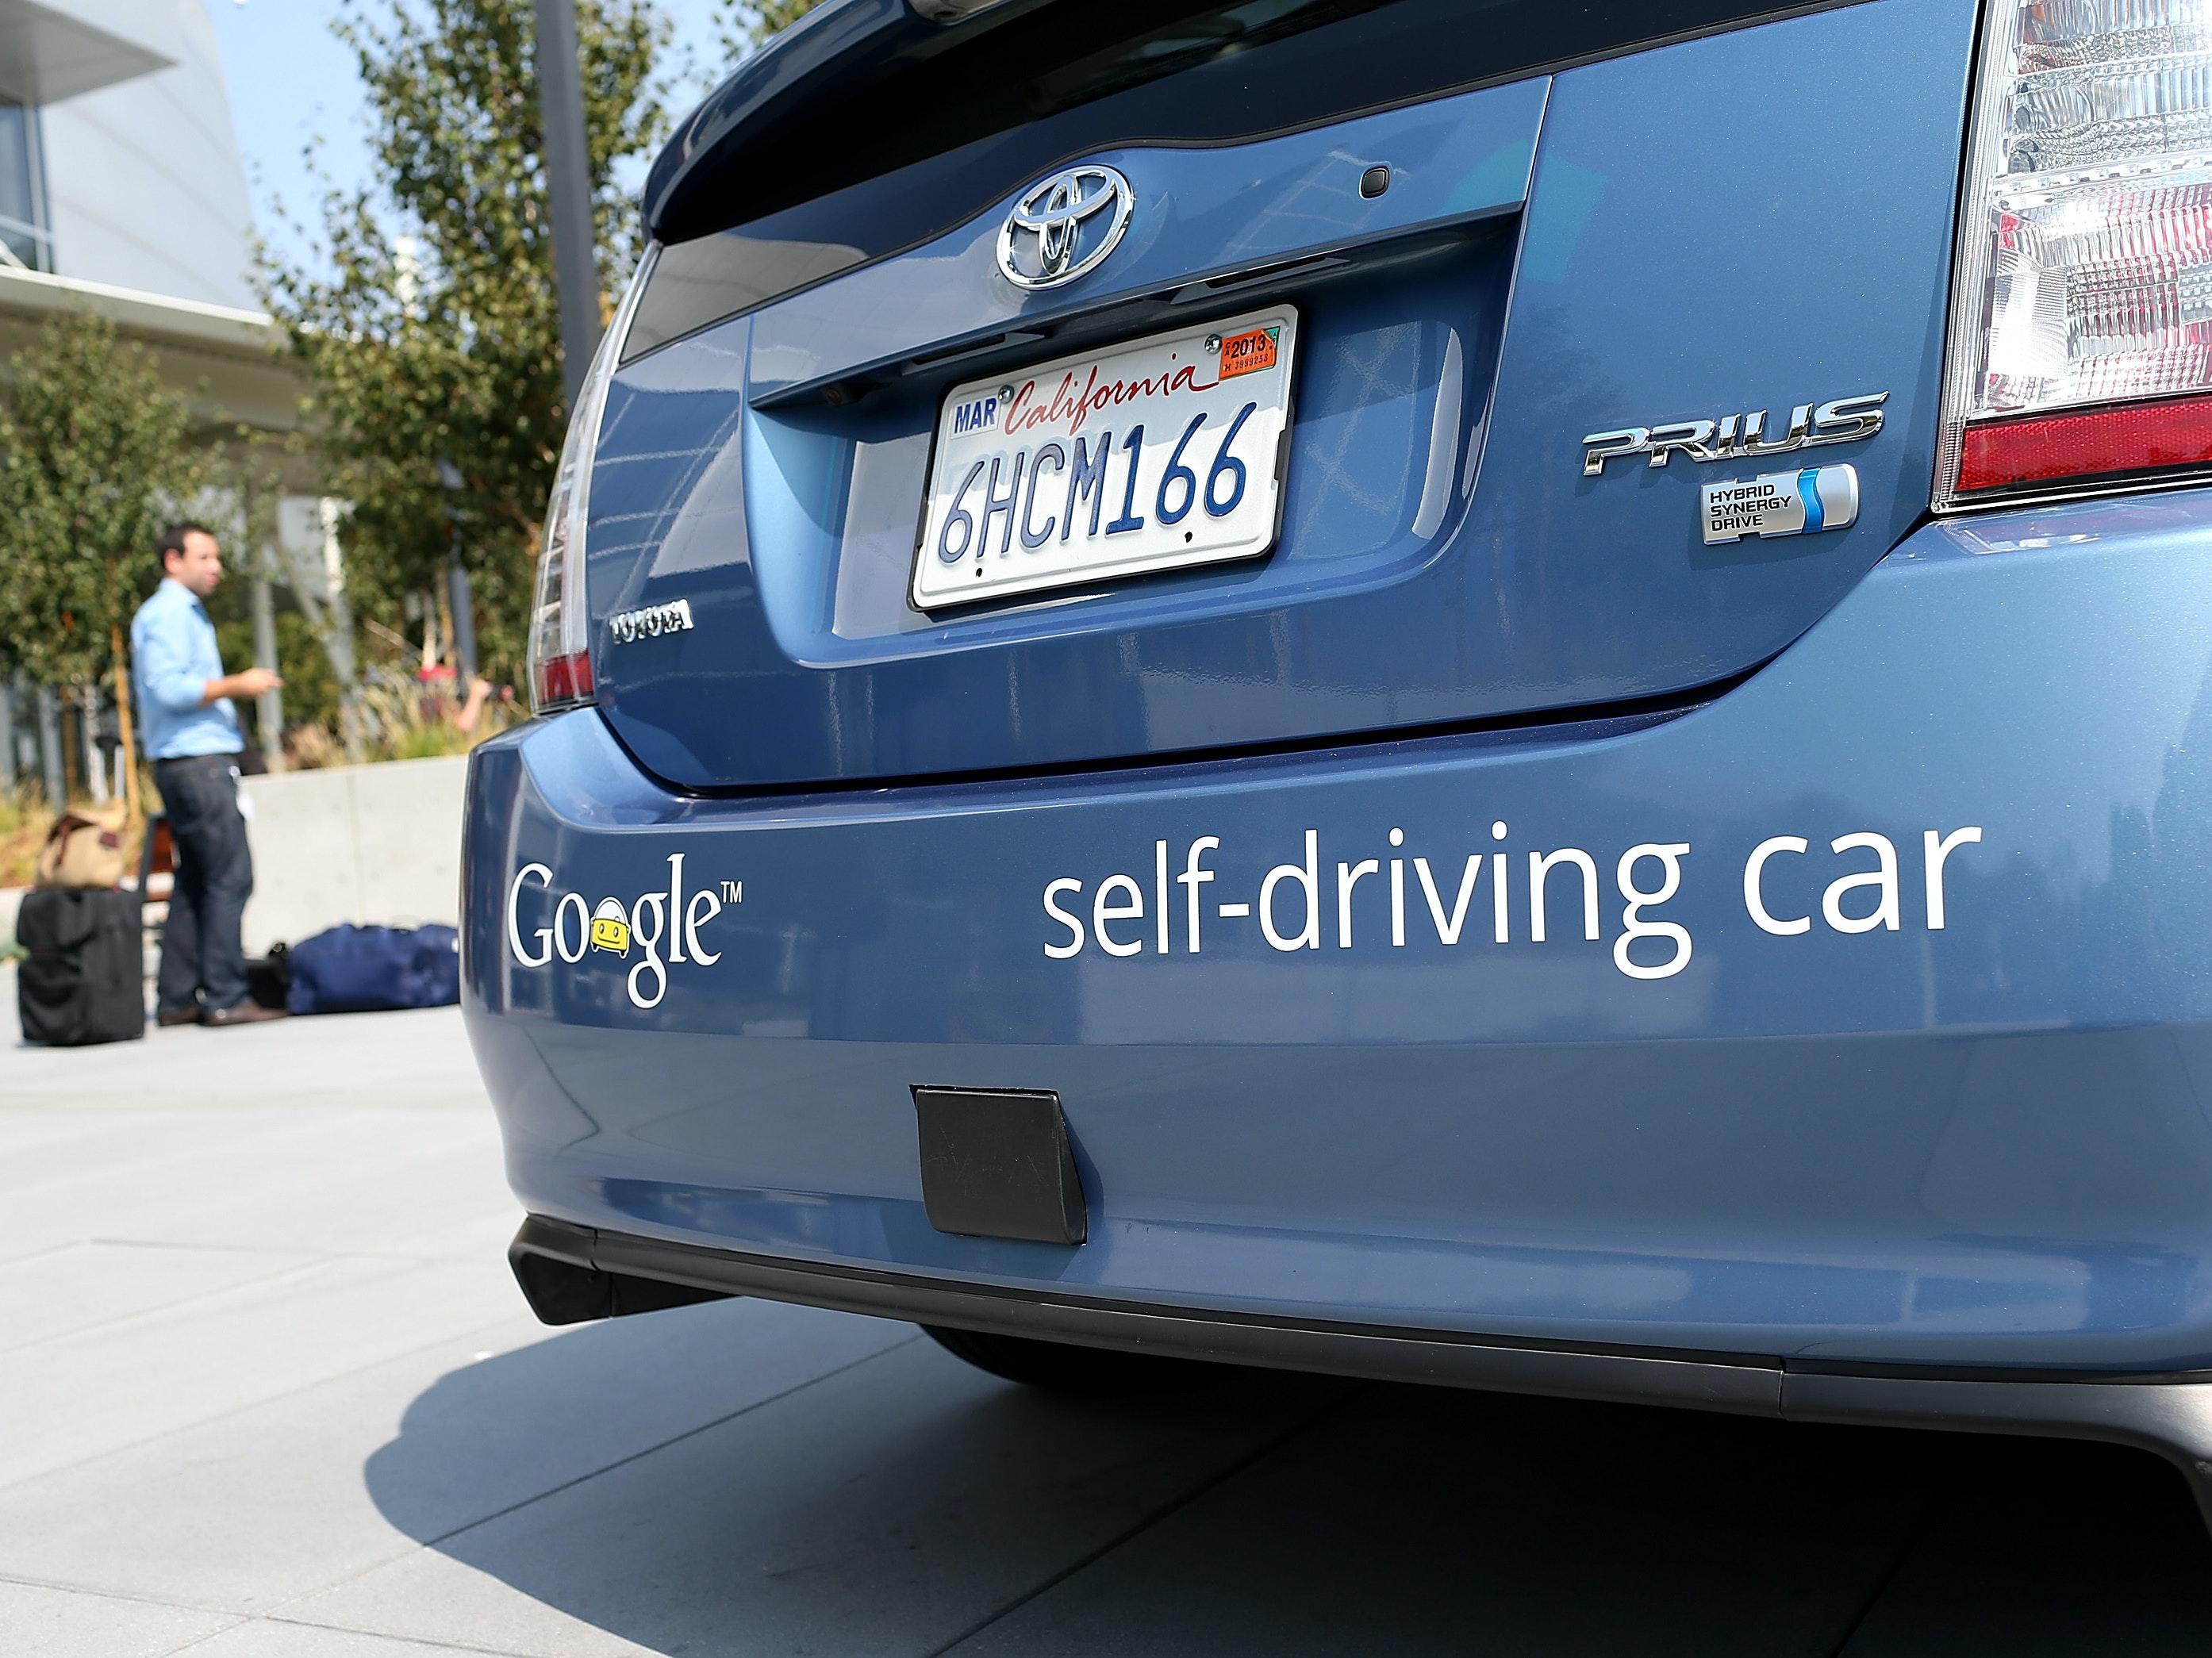 Google's 2012 self-driving car prototype.